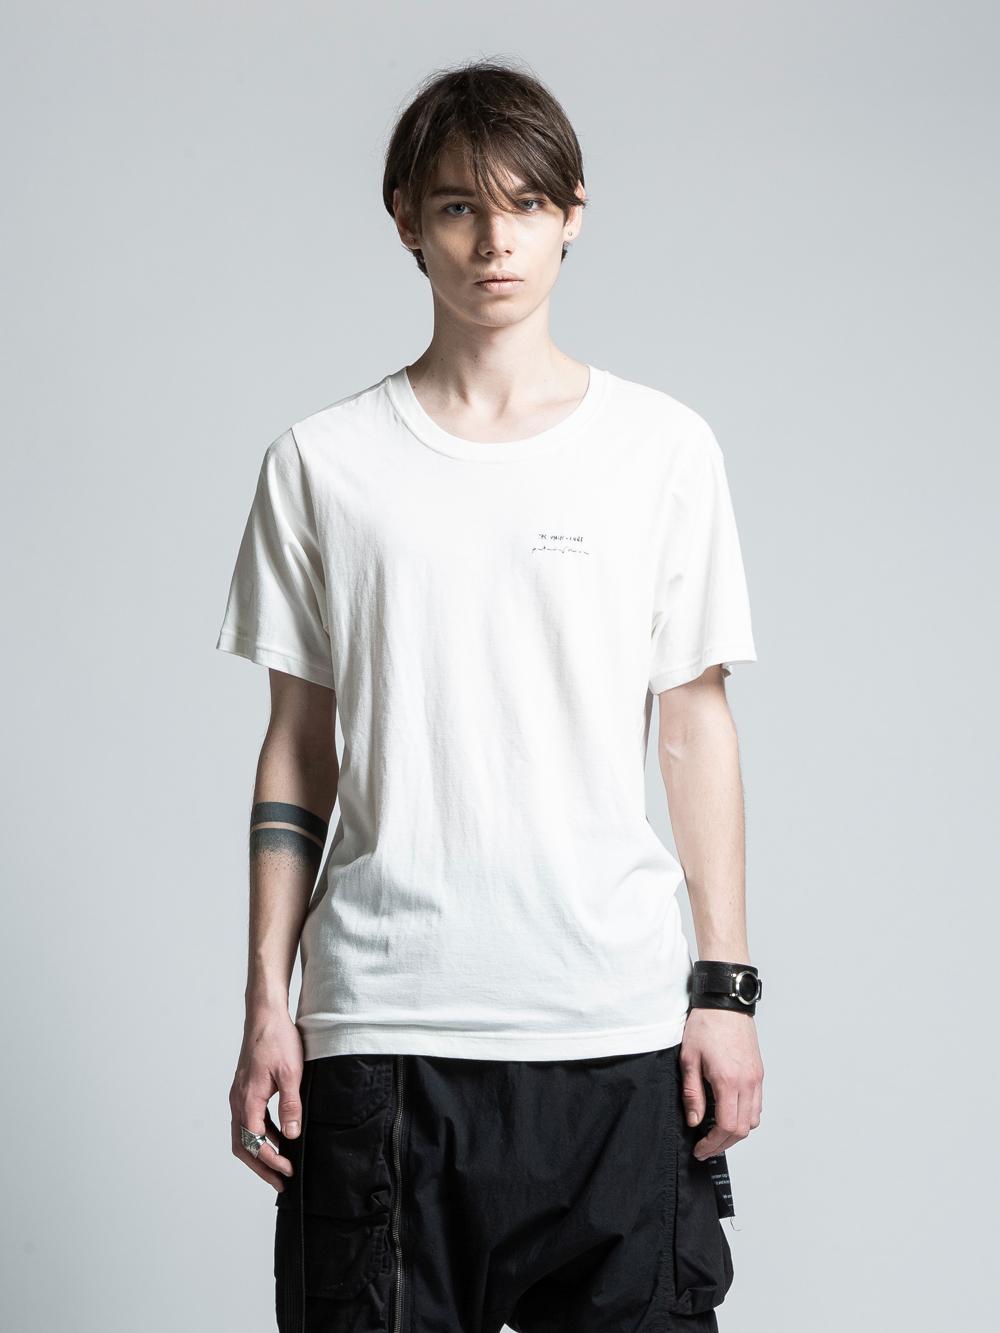 VI-PM-006-01 / PATRICIA MARCH コラボレーションバックプリントTシャツ